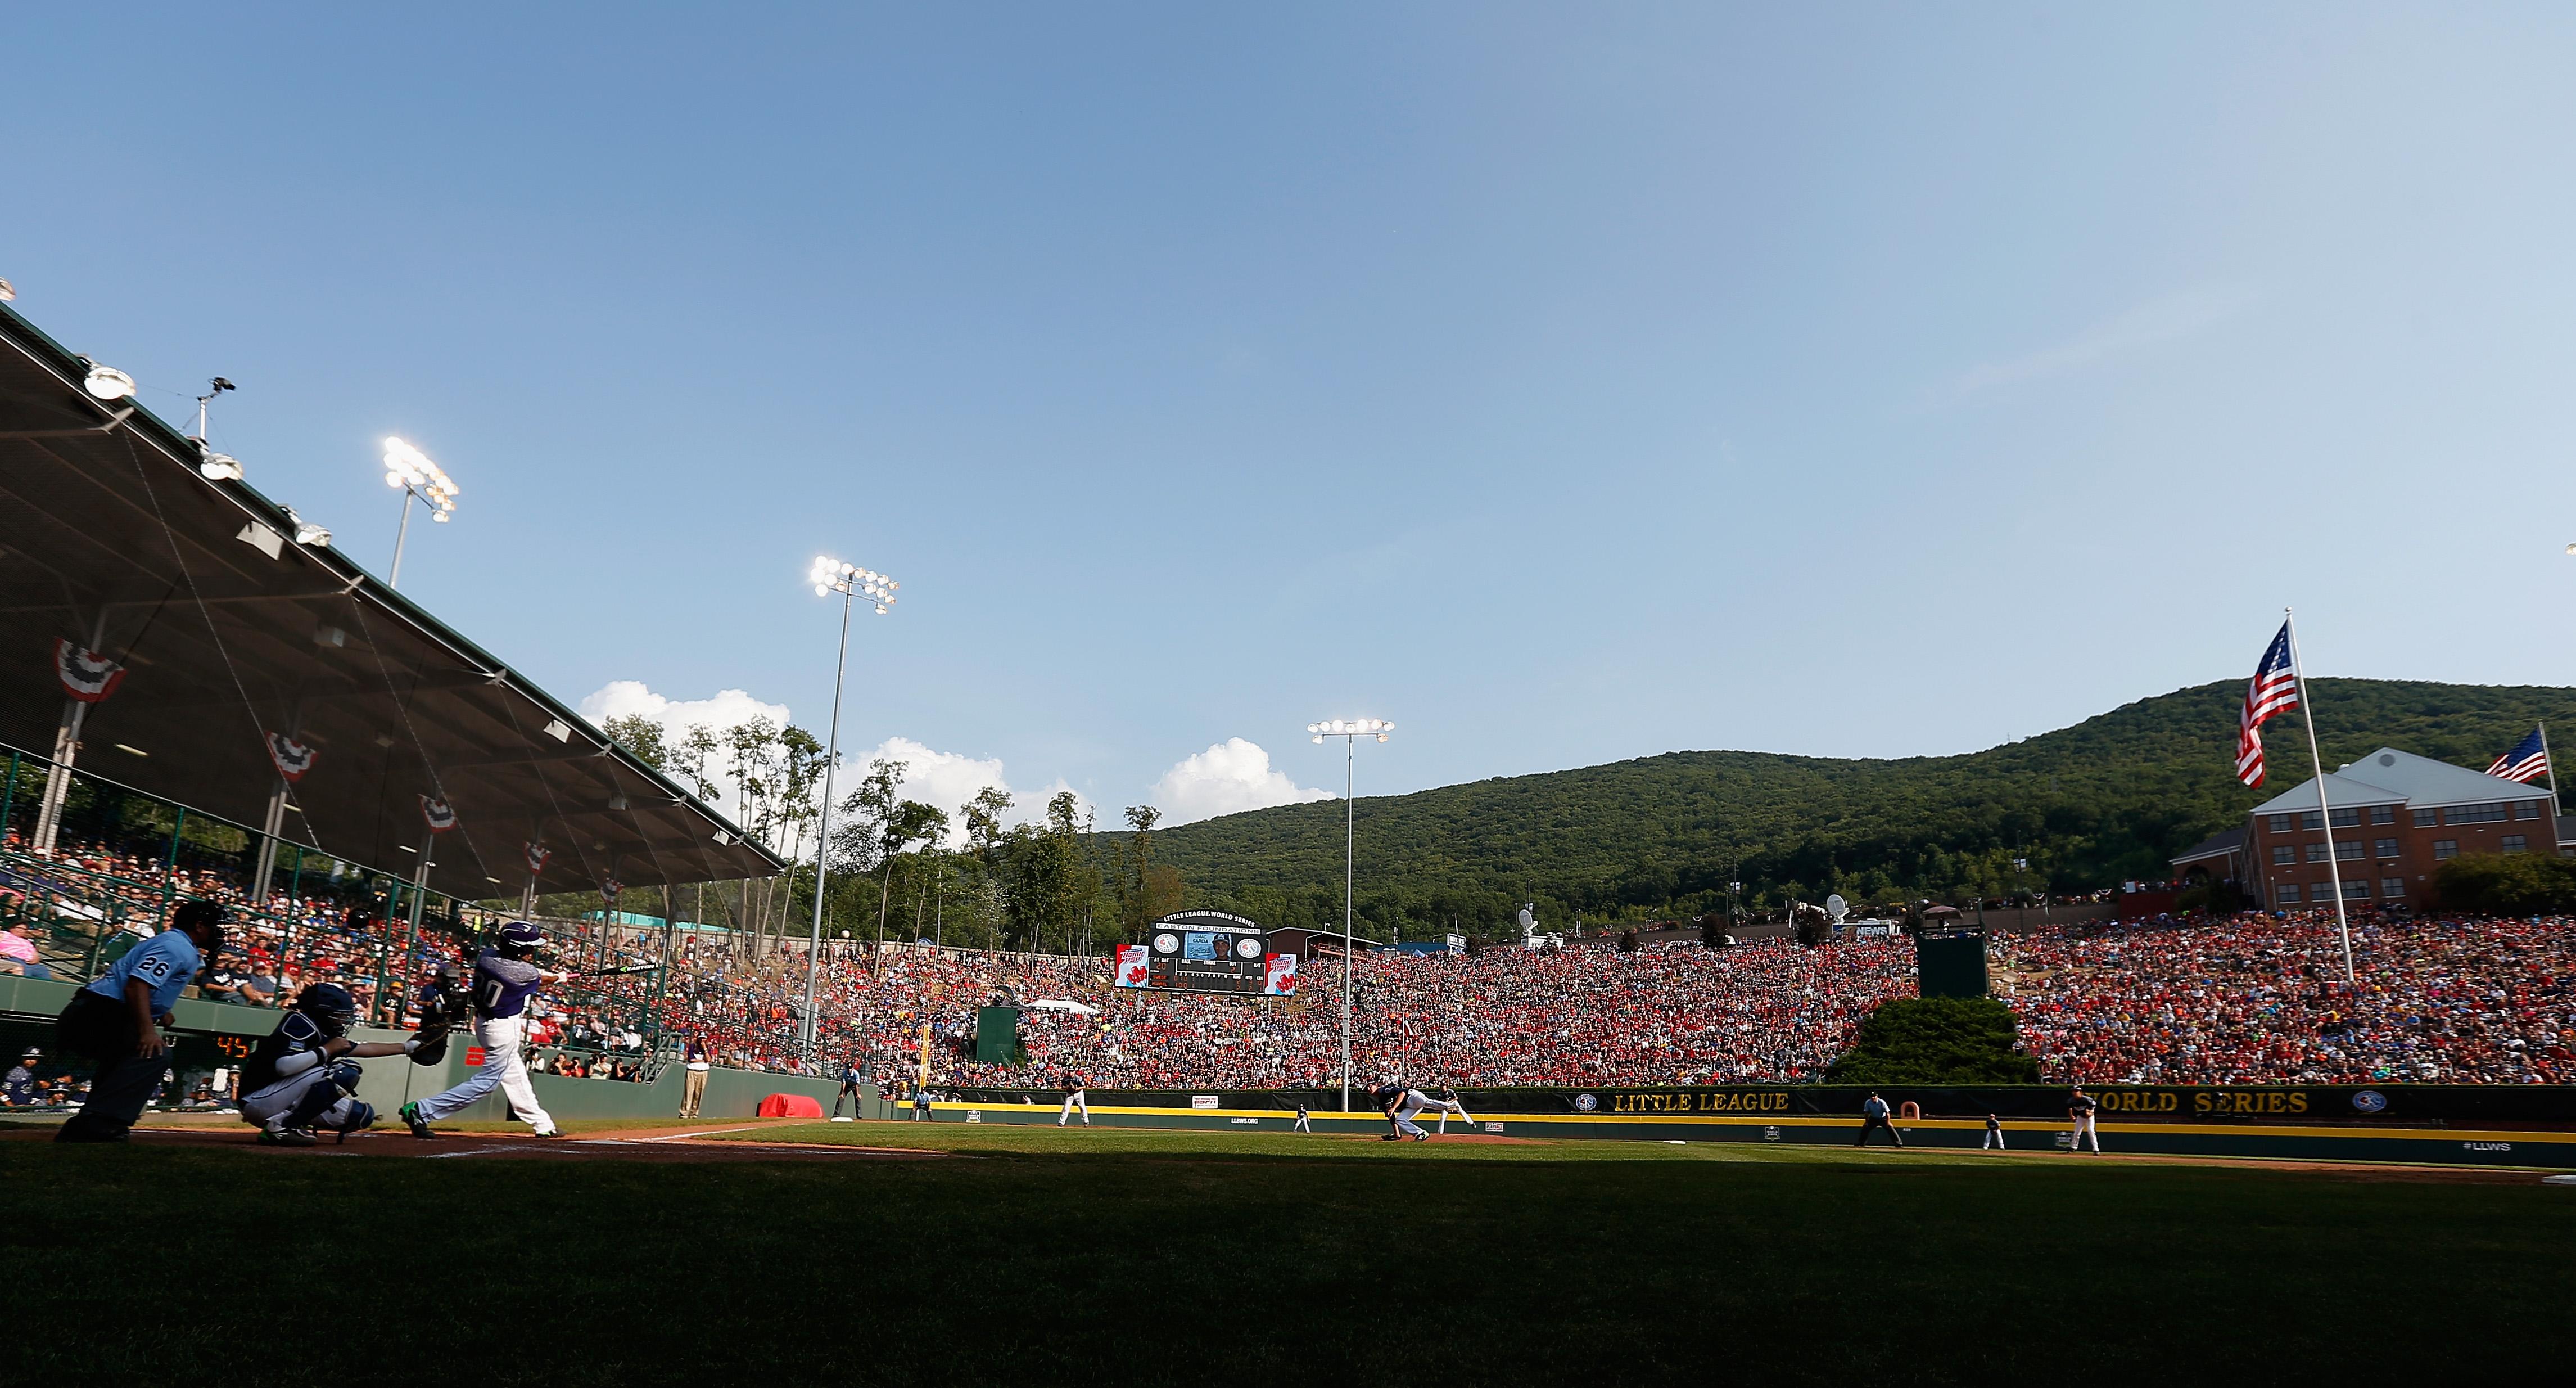 Little League World Series-US Championship